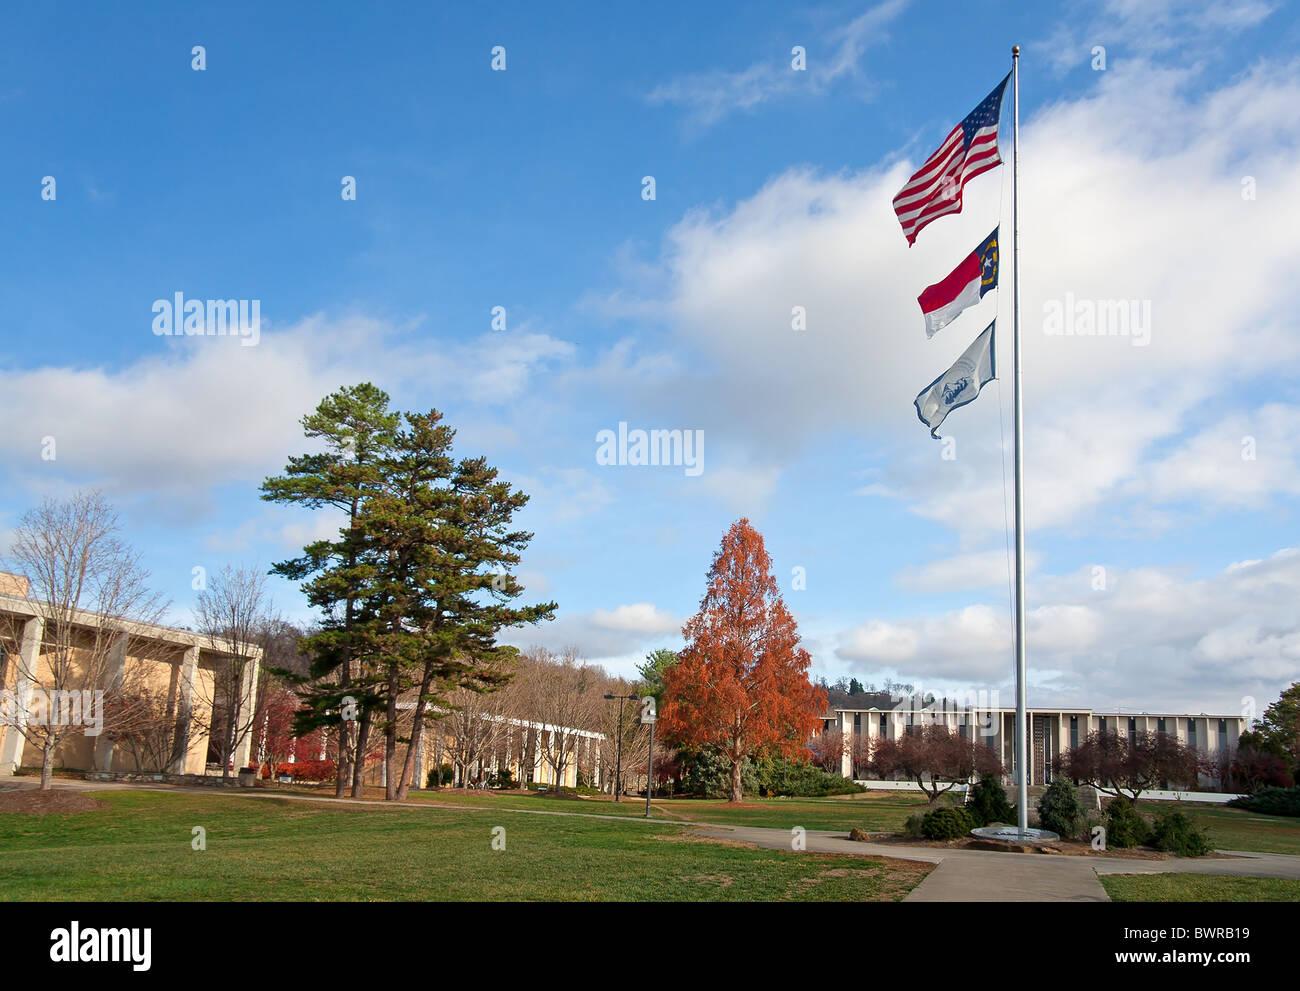 University of North Carolina at Asheville campus. Stock Photo